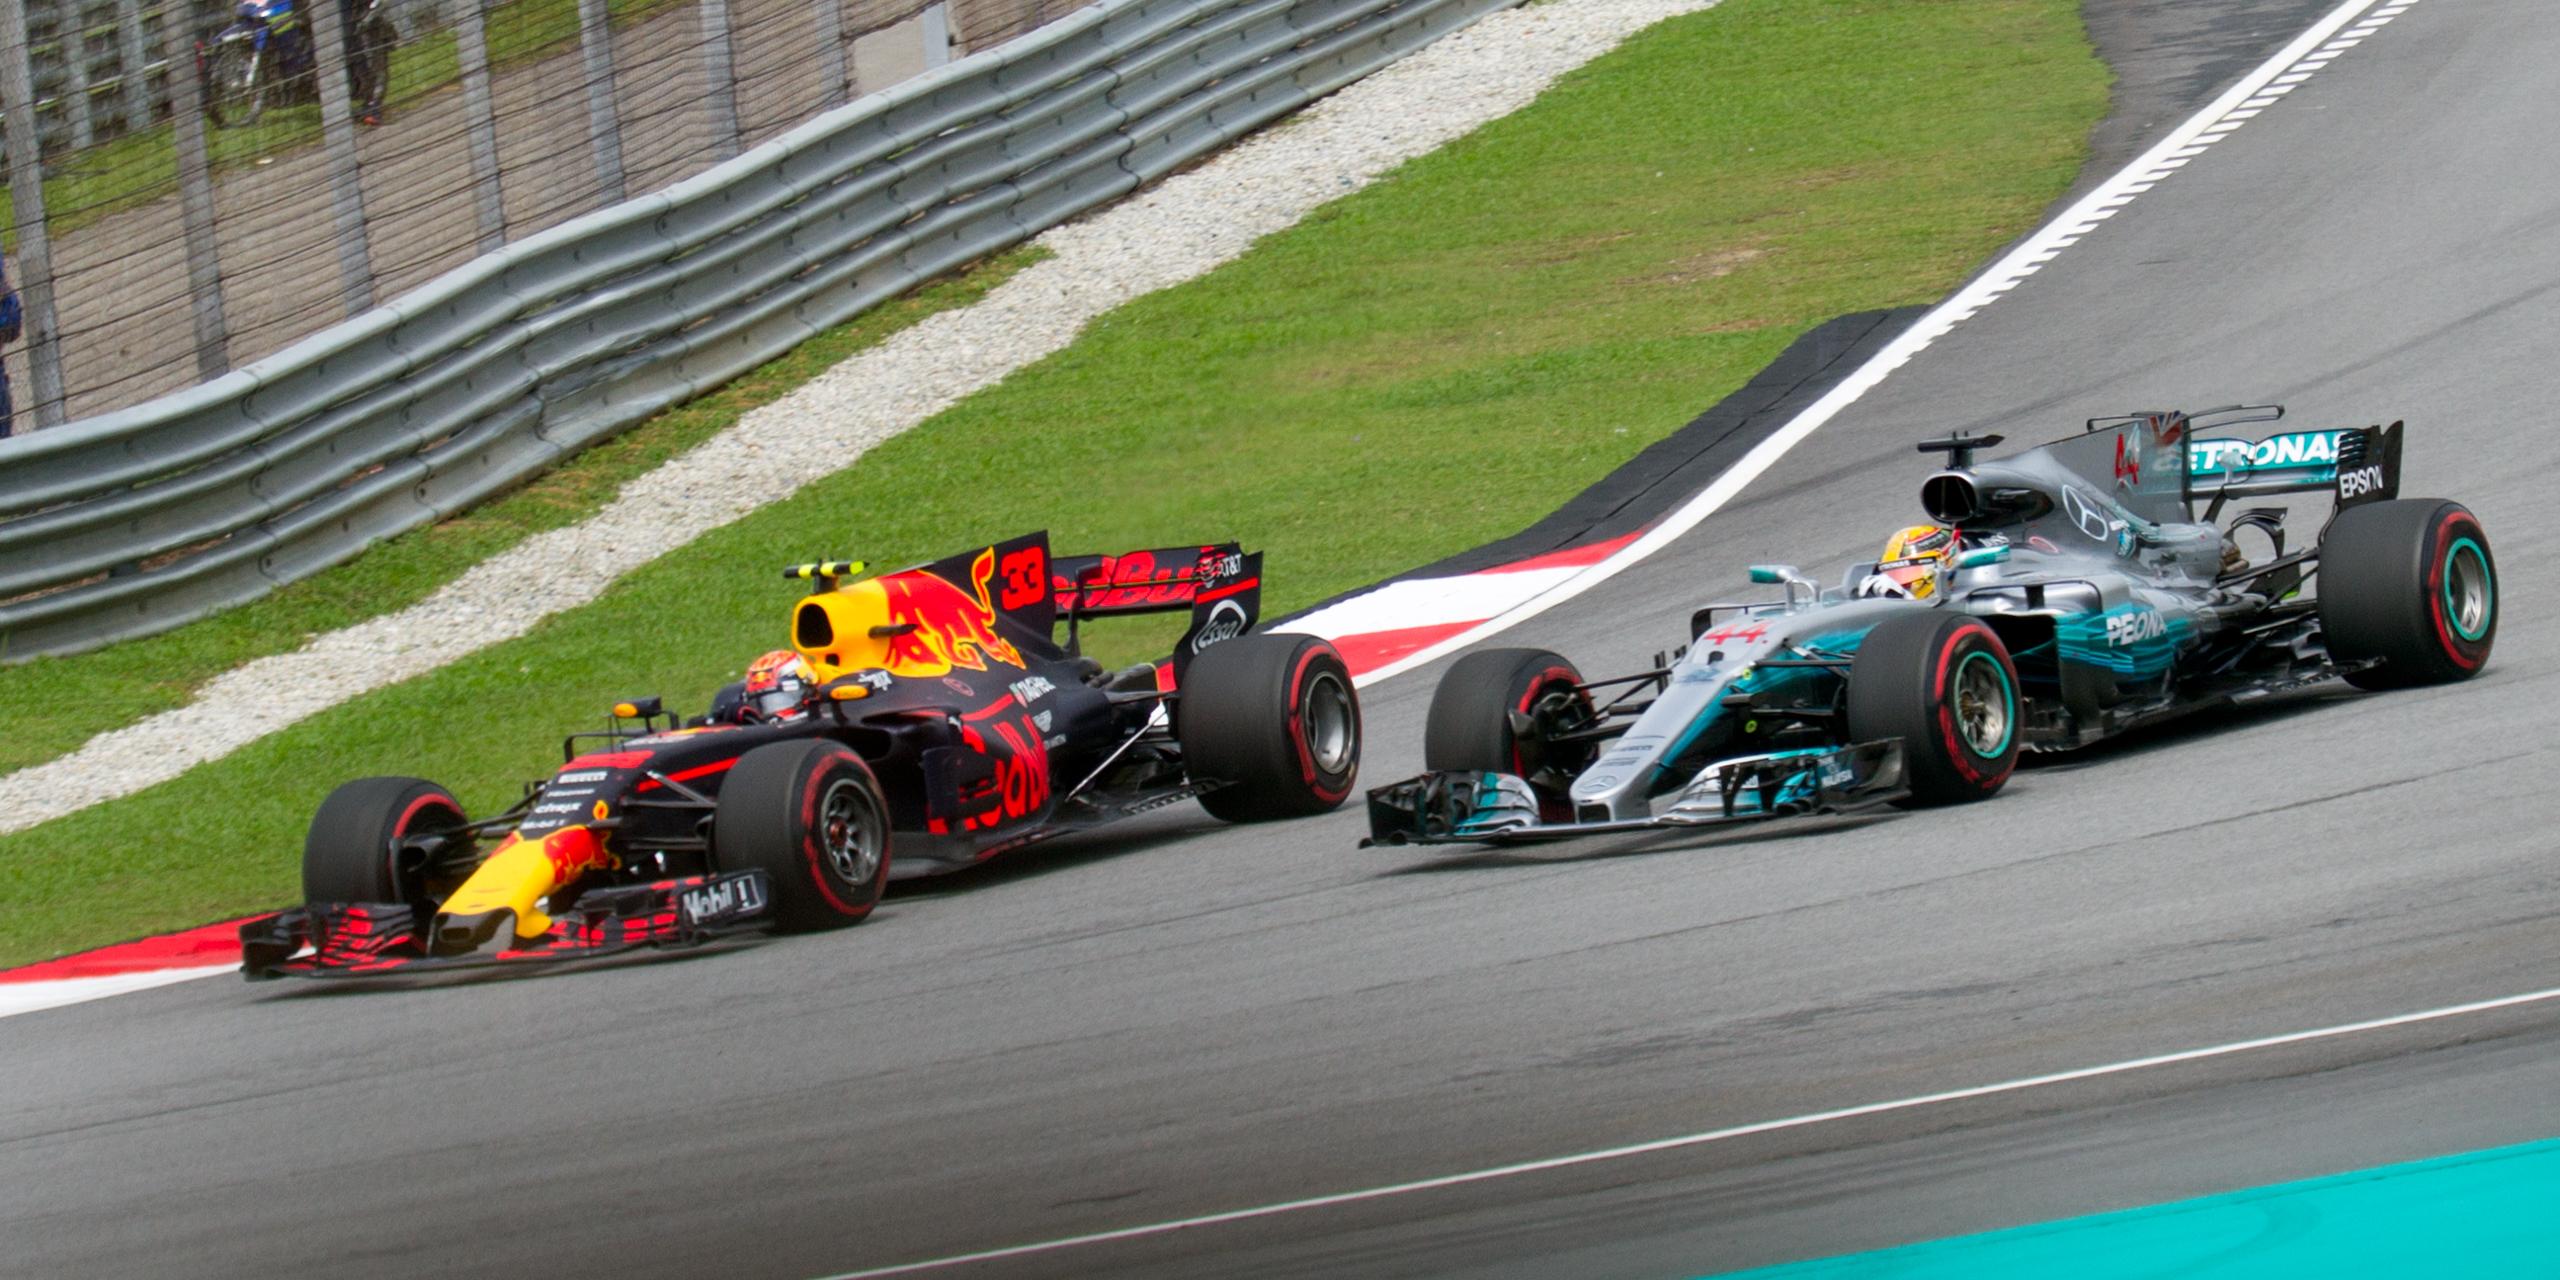 Tickets Grand Prix van Spanje - Barcelona 2021